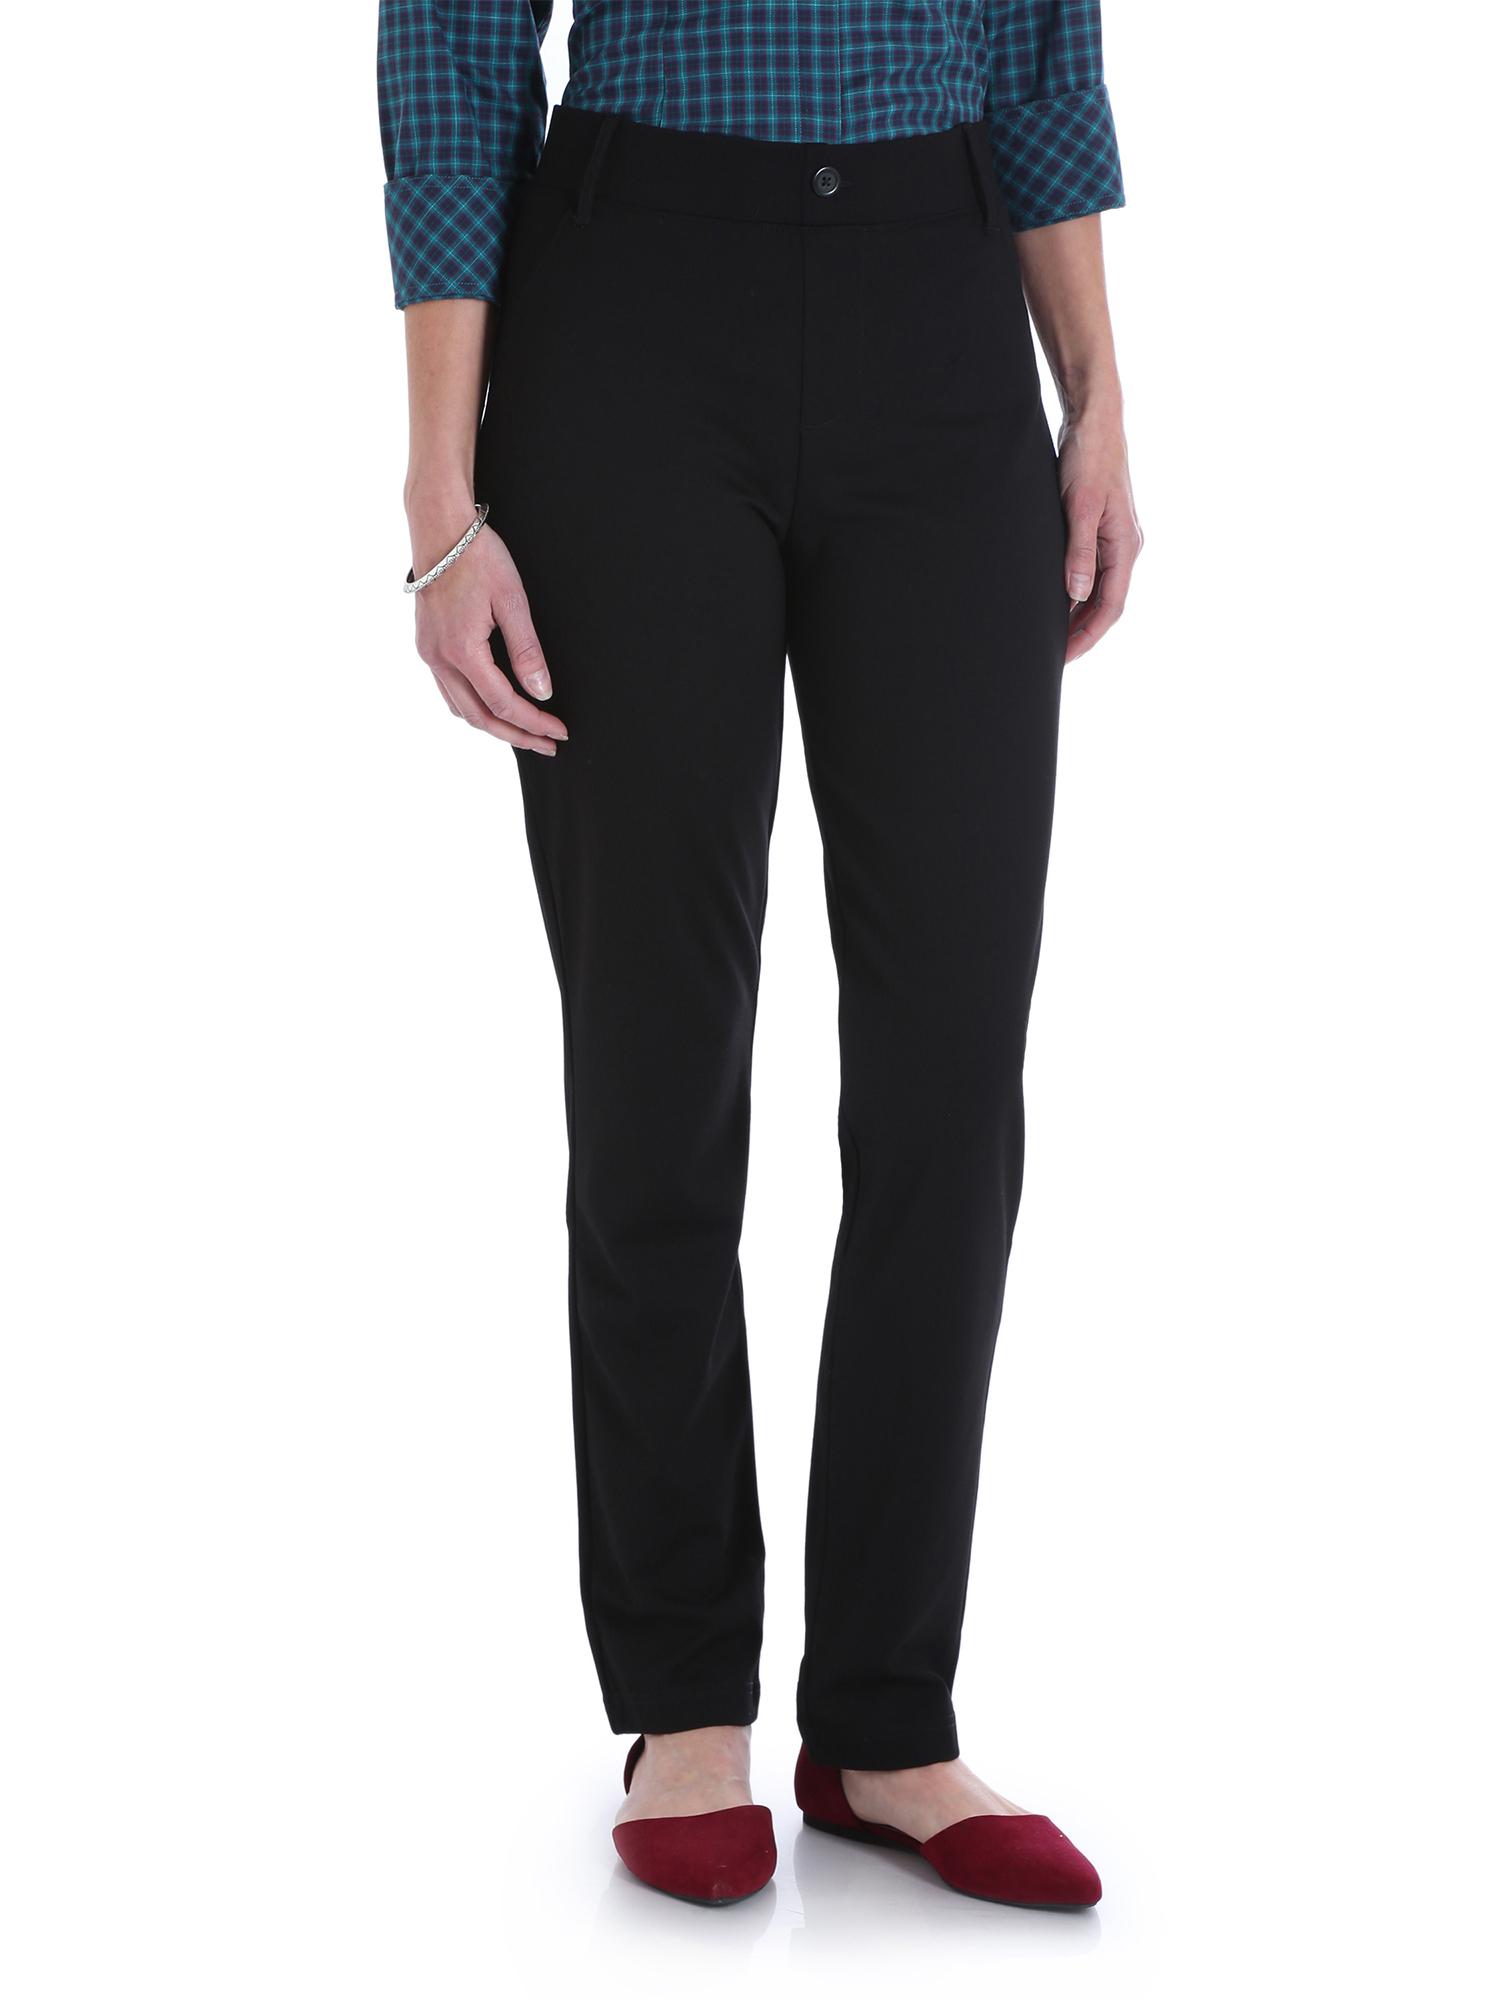 Women's Slim Straight Knit Pull On Pant